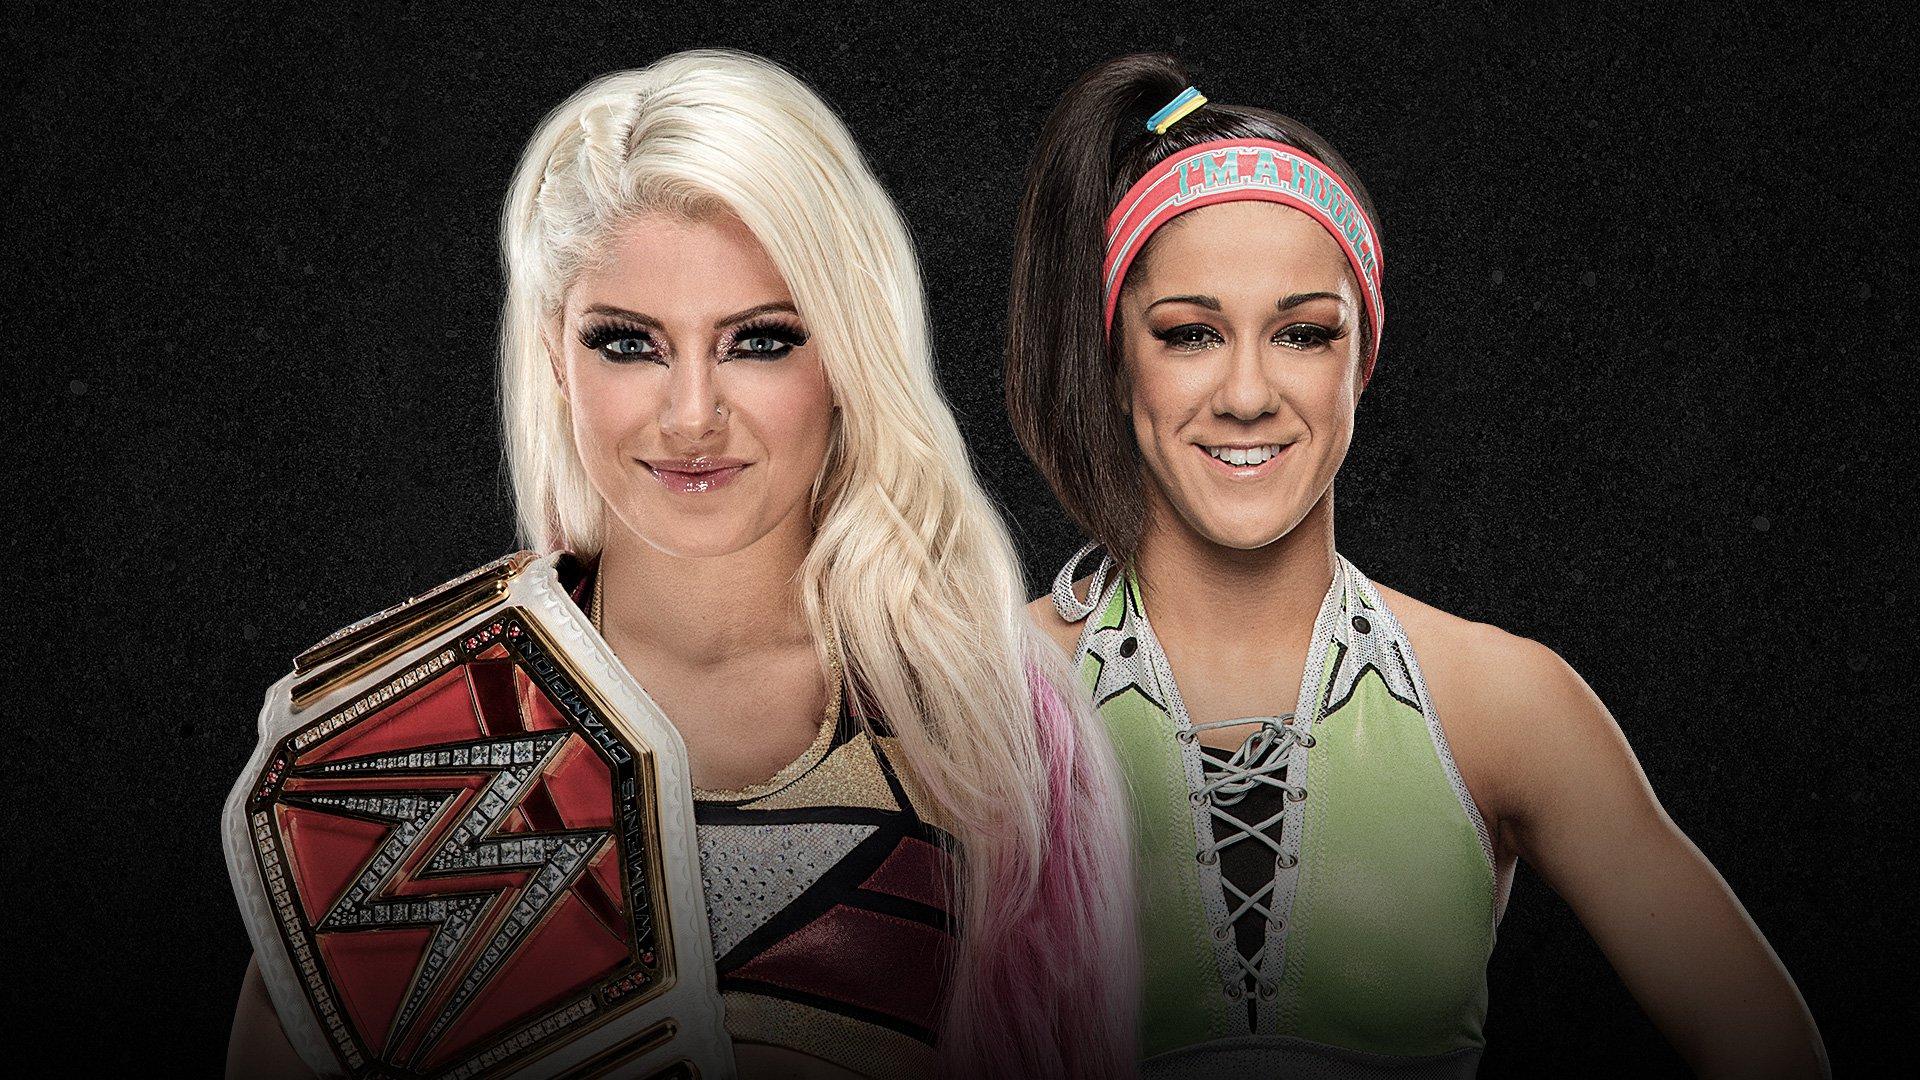 WWE Extreme Rules 2017: Alexa Bliss vs. Bayley